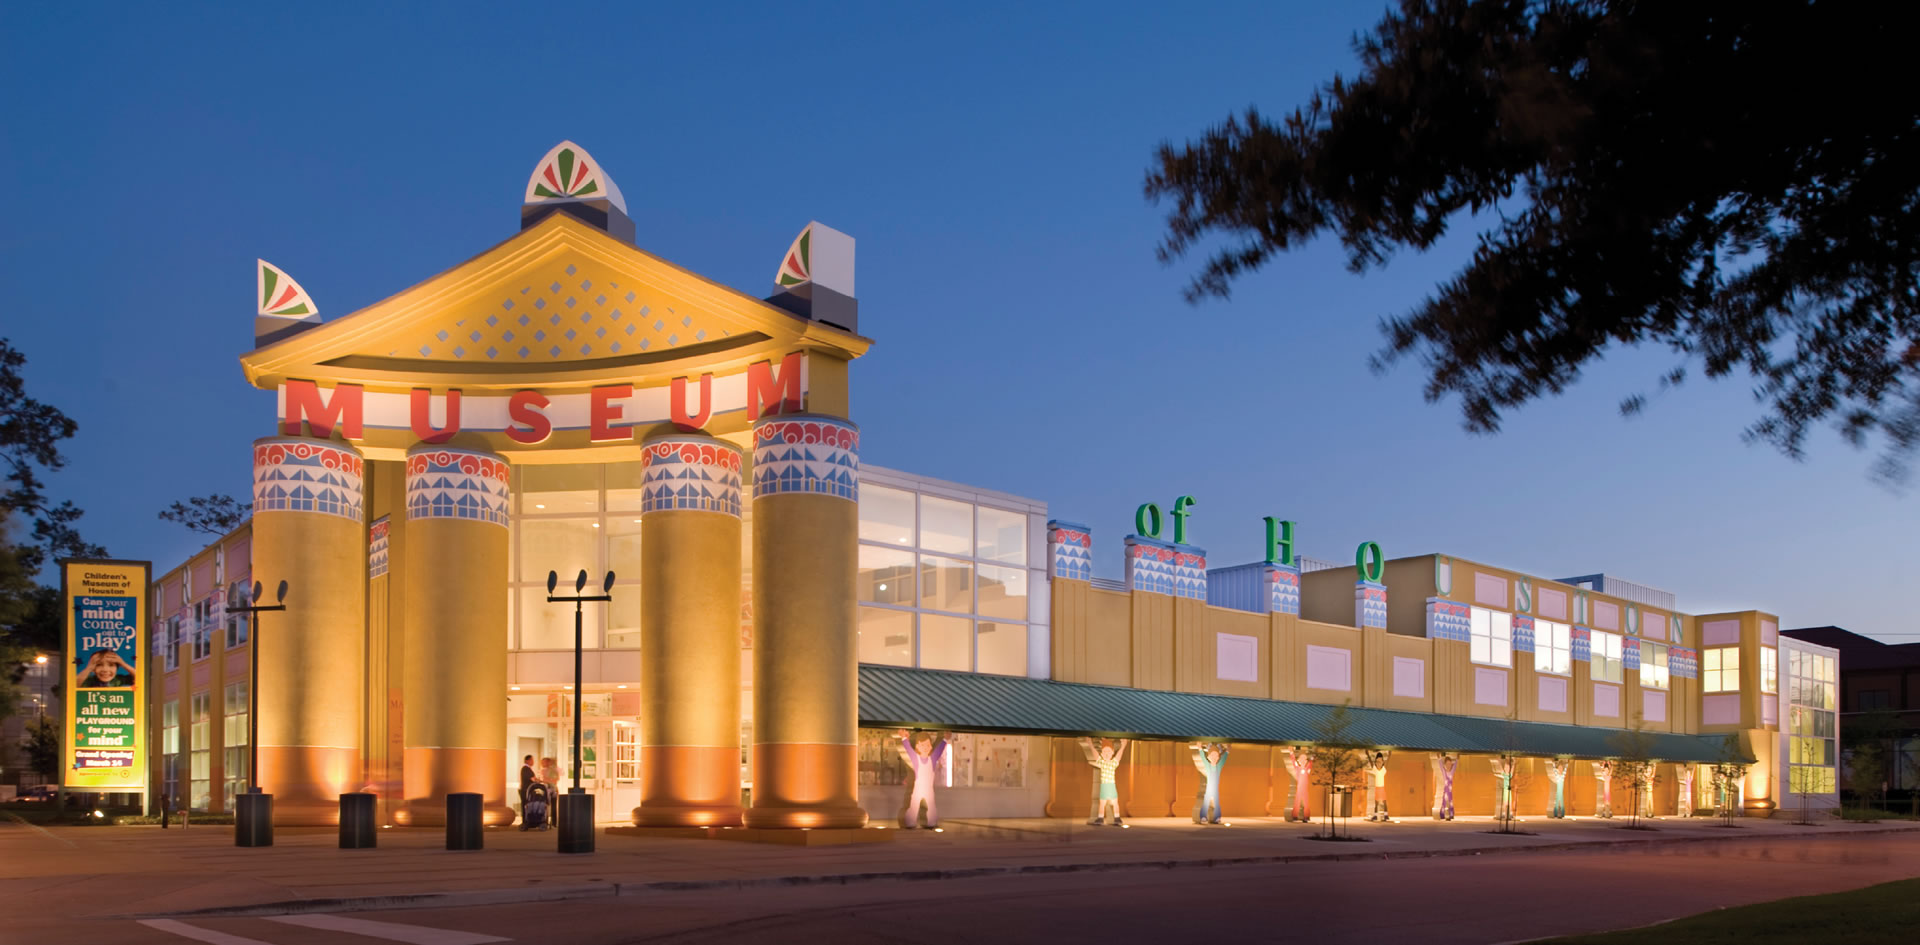 Architecture S In Texas | Jackson Ryan Architects Children S Museum Of Houston